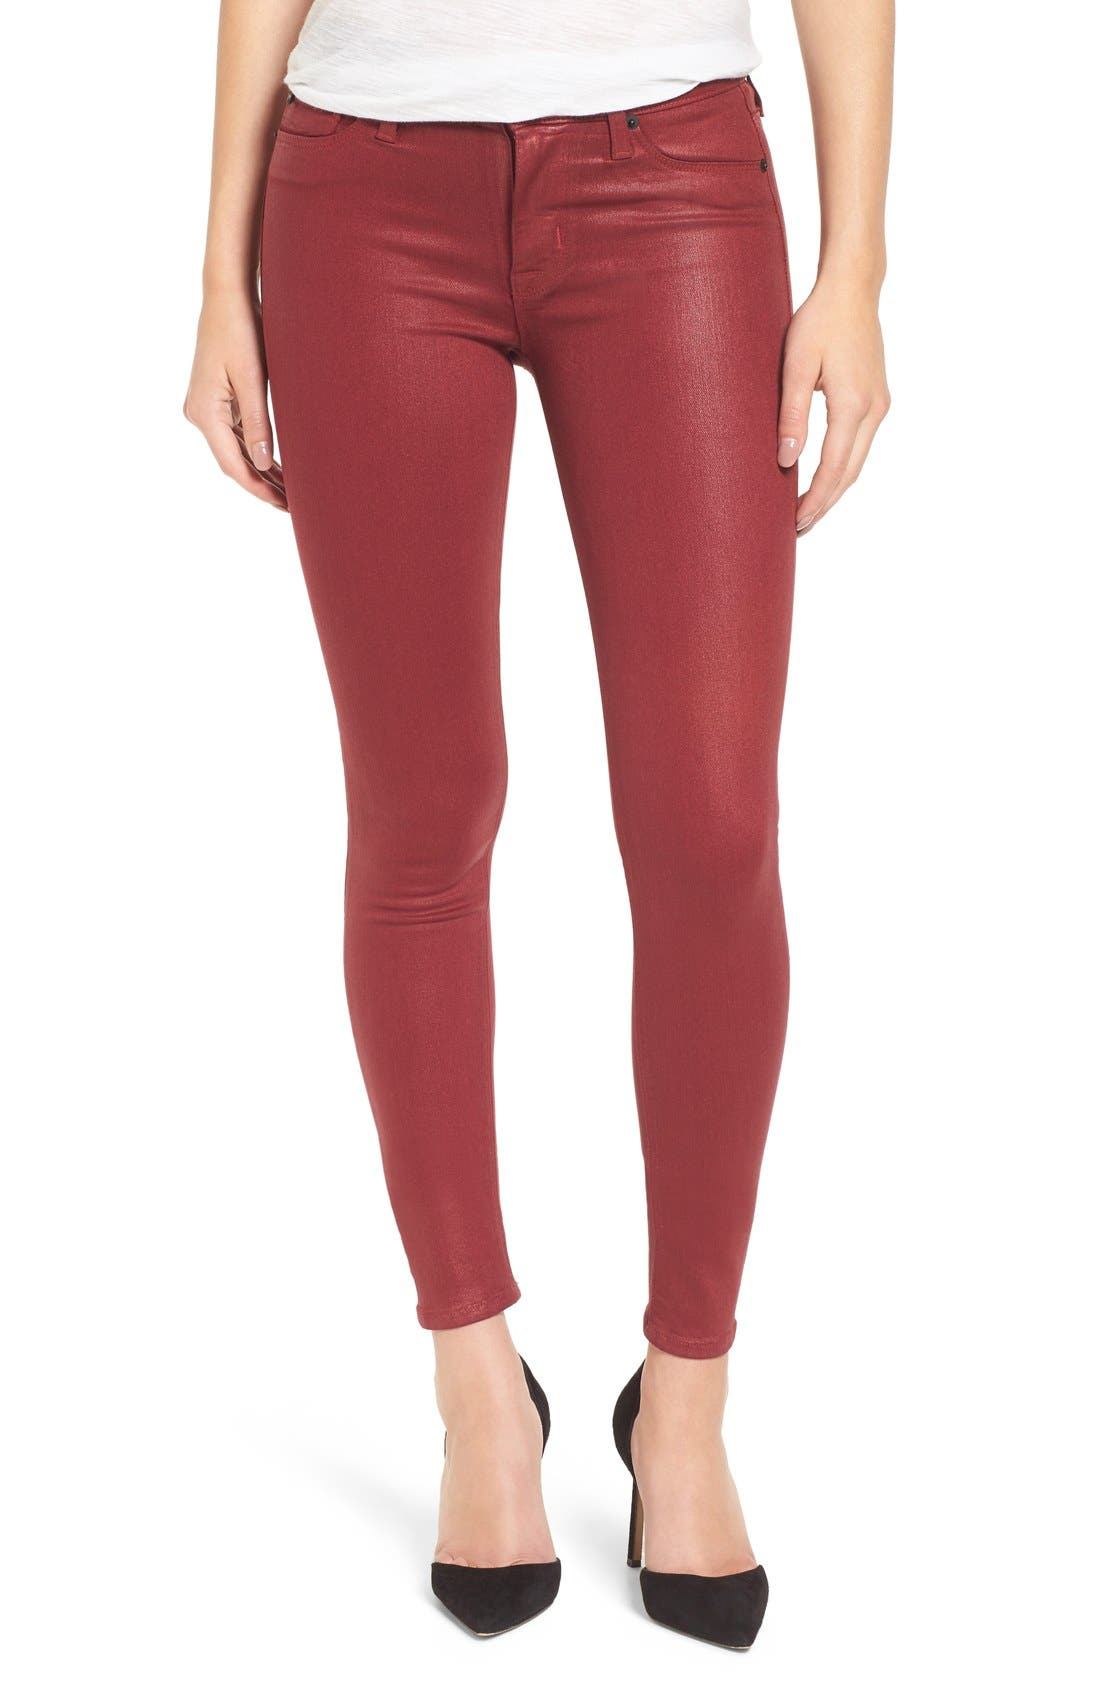 Alternate Image 1 Selected - HudsonJeans Nico Coated Super Skinny Jeans